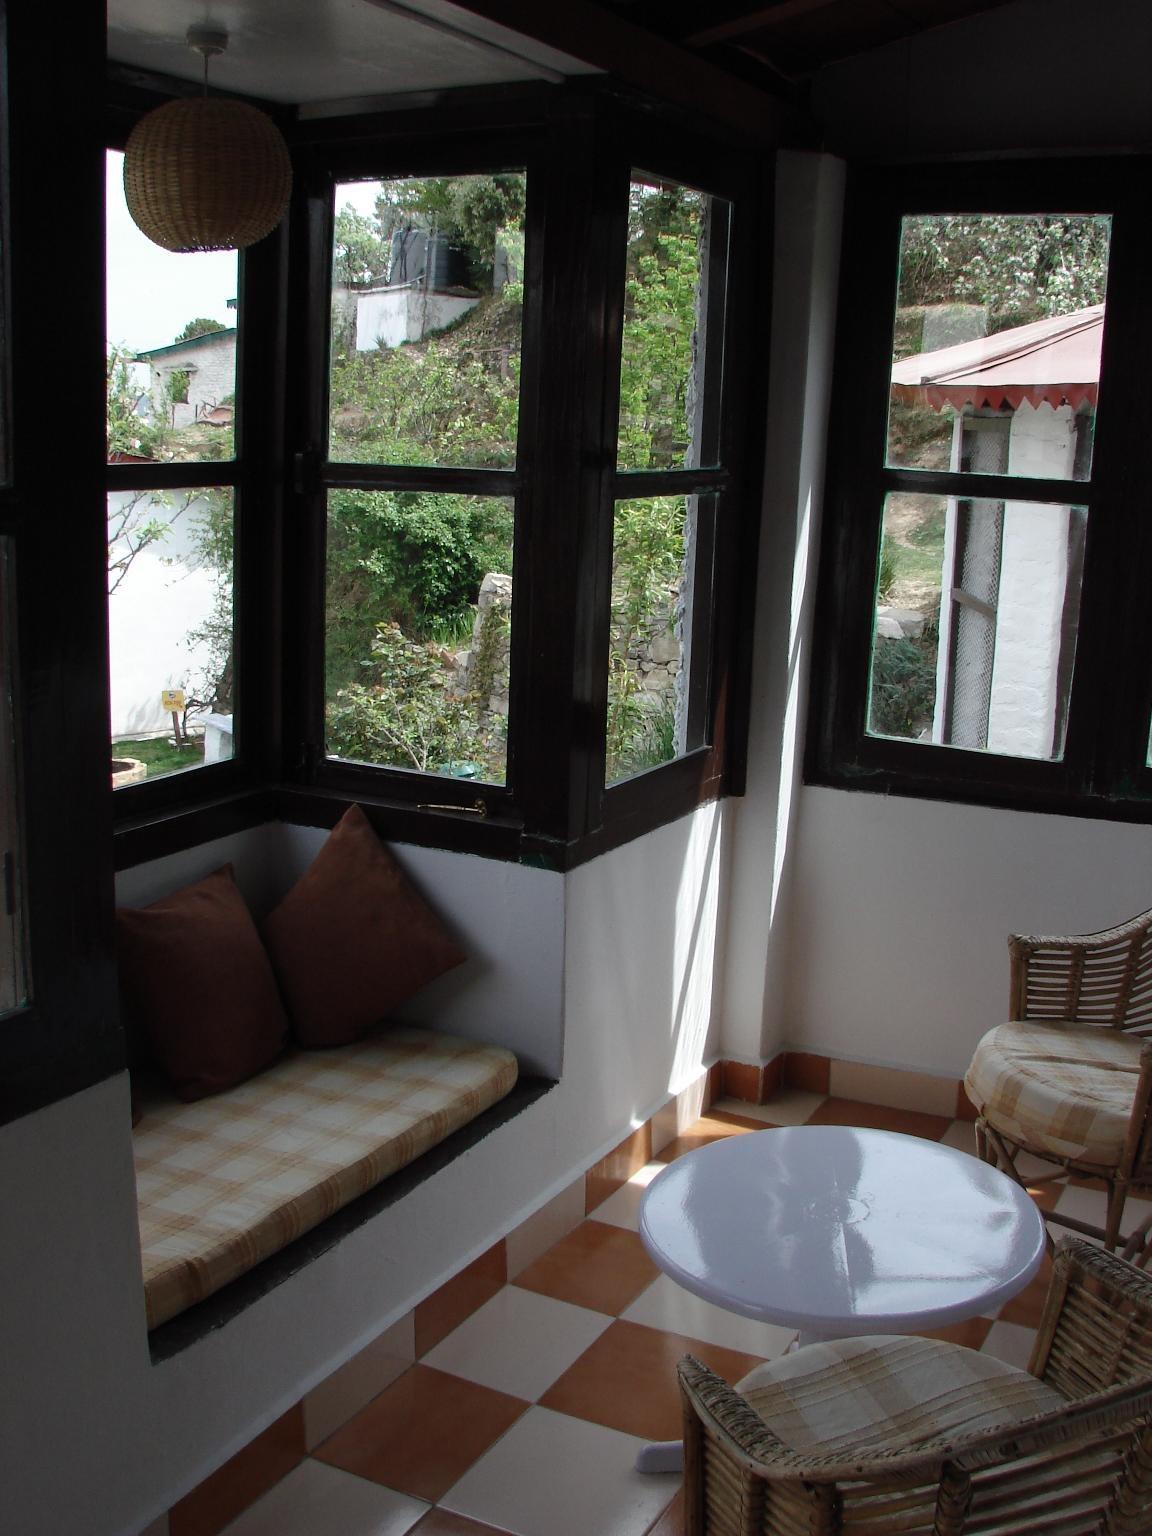 Gallery image of Mountain Resort